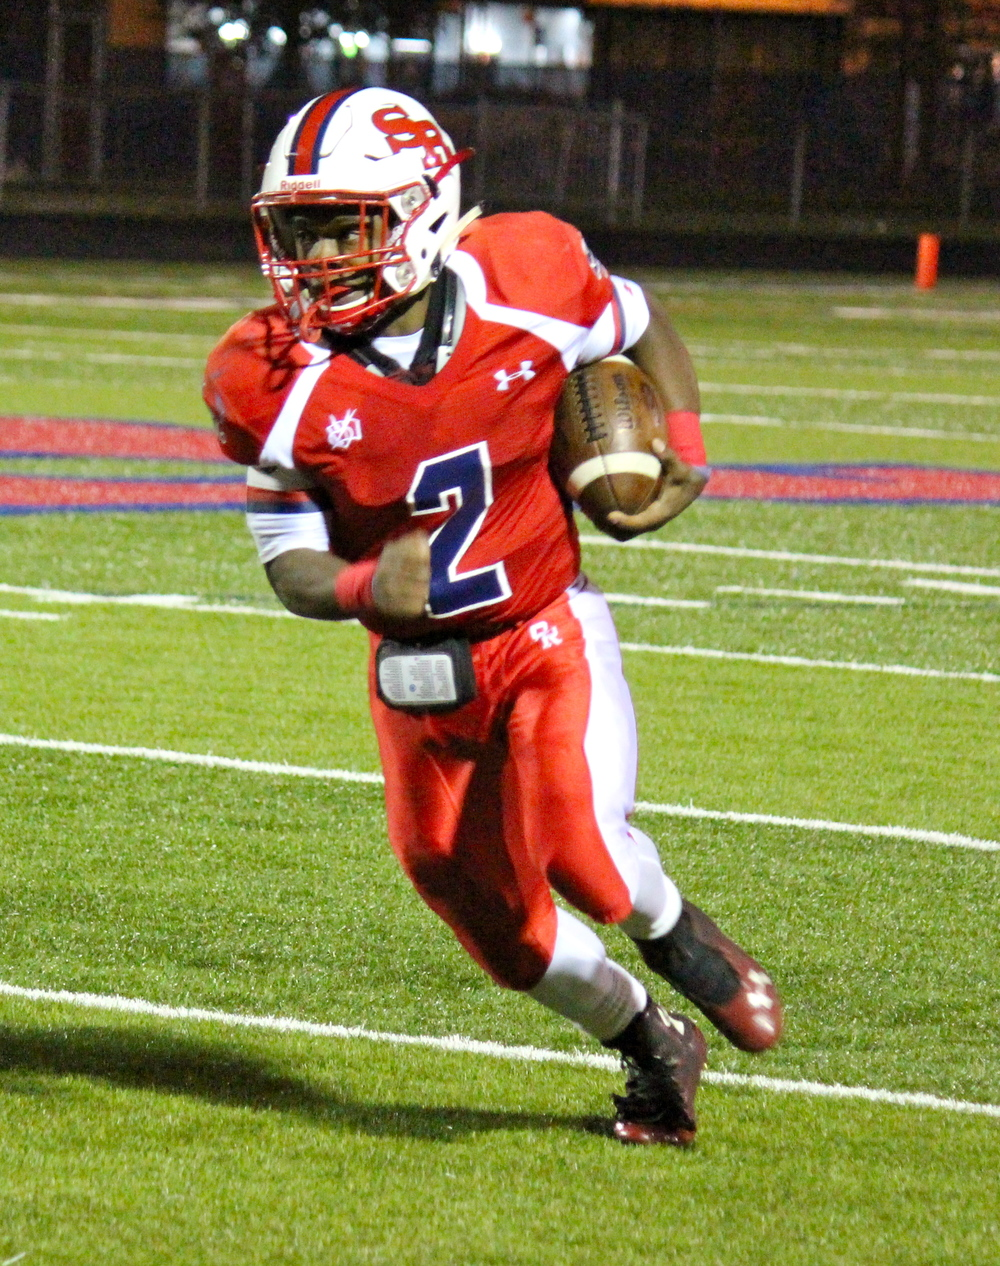 St. Rita running back junior Shaun Rule (#2 Calvin Christian School)